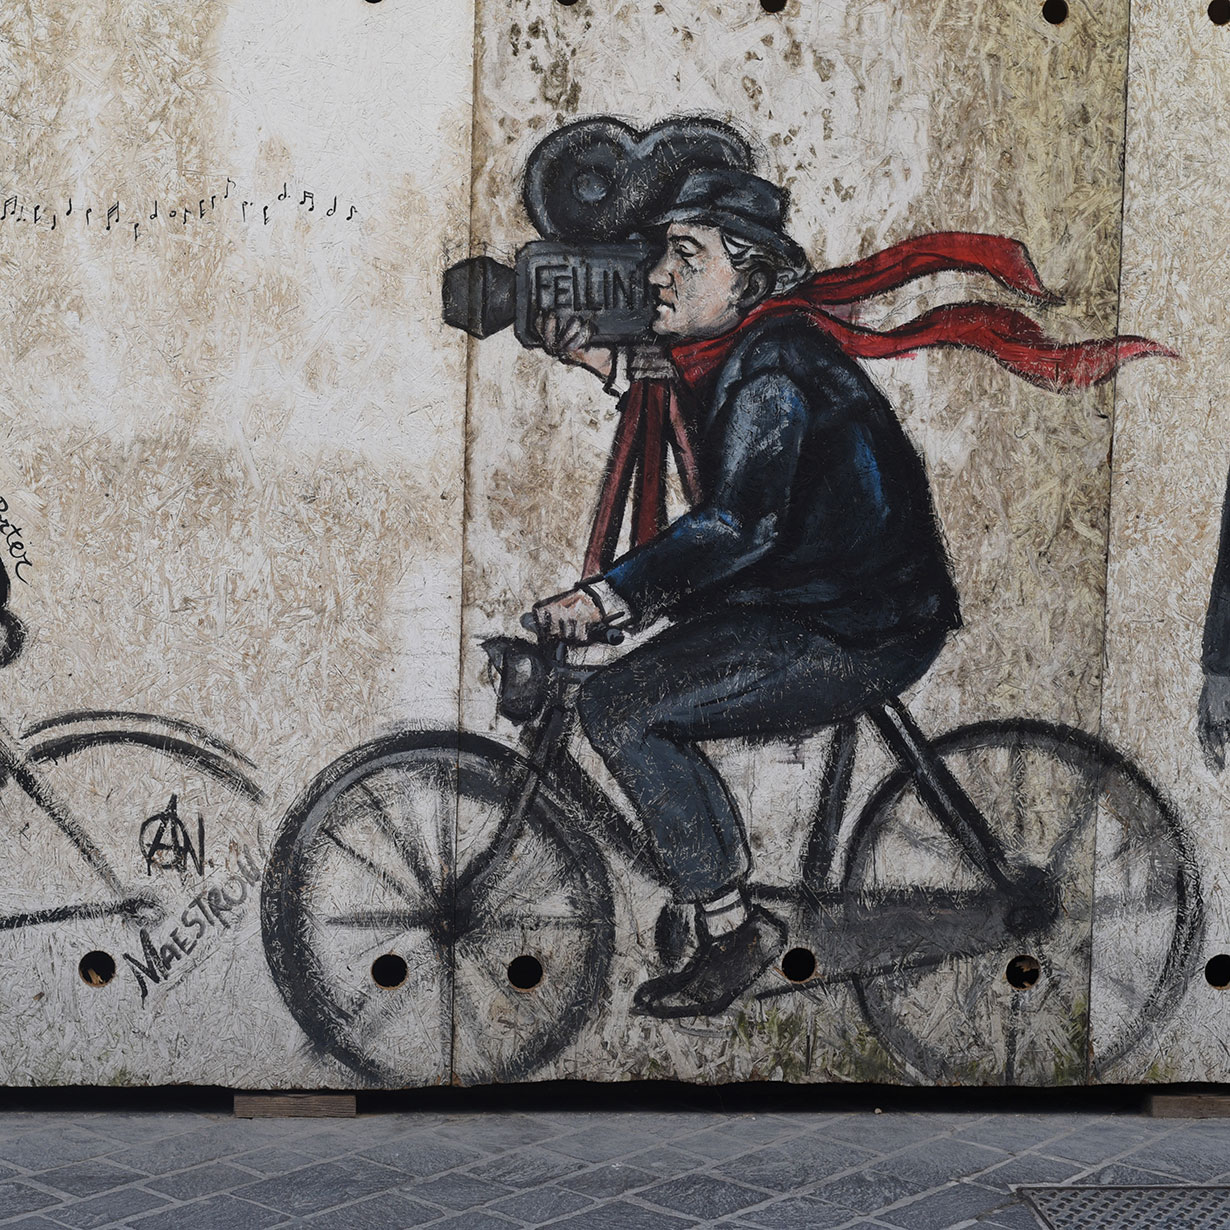 Fellini in Ravenna, Italy